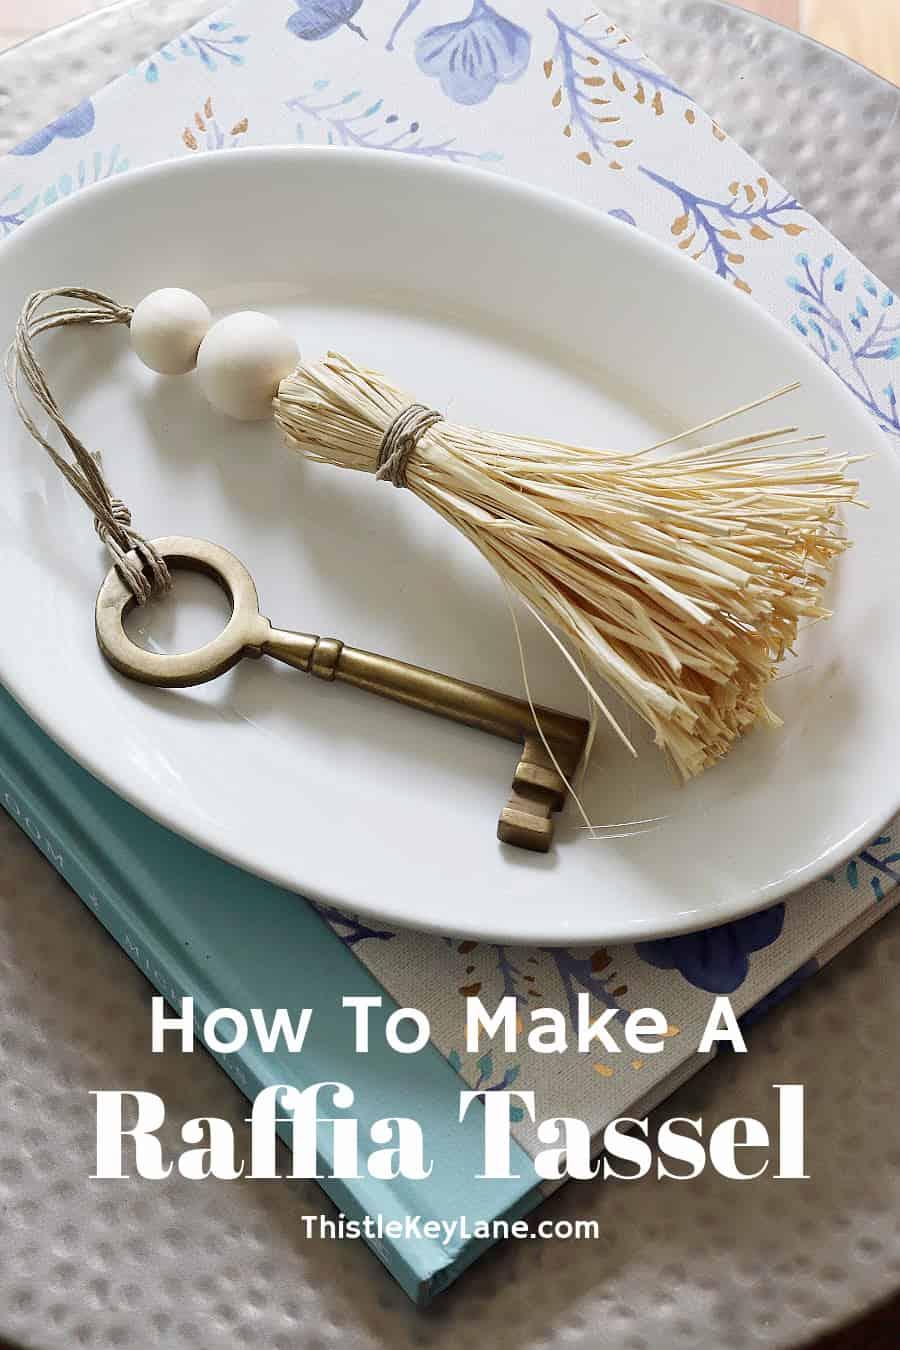 How To Make Raffia Tassels